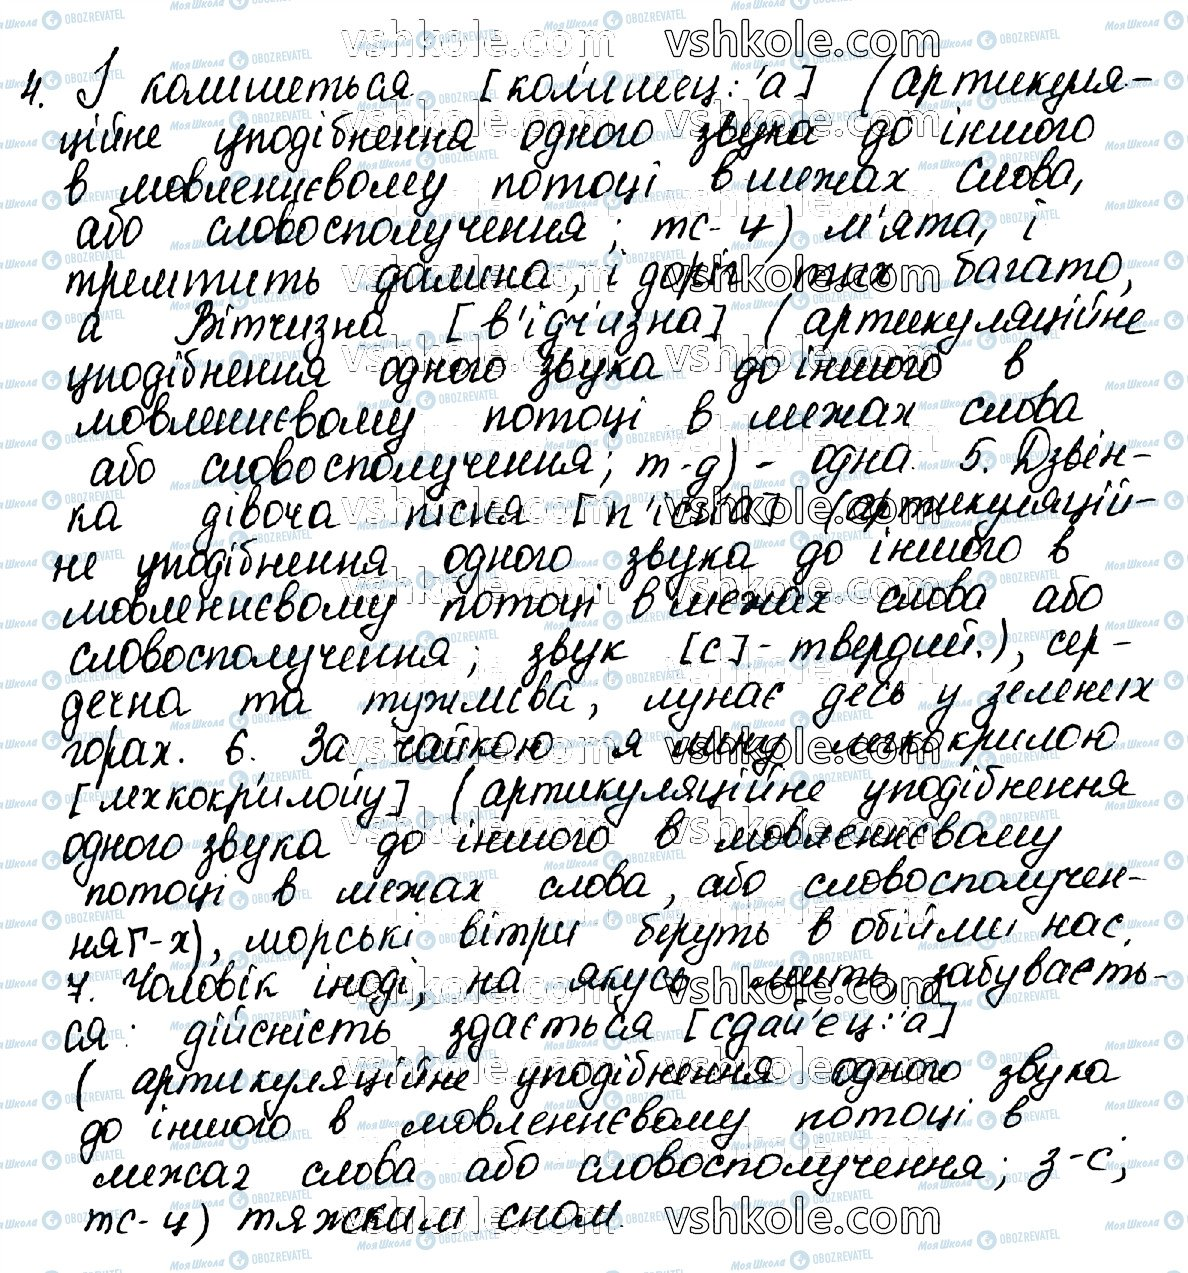 ГДЗ Укр мова 10 класс страница 70